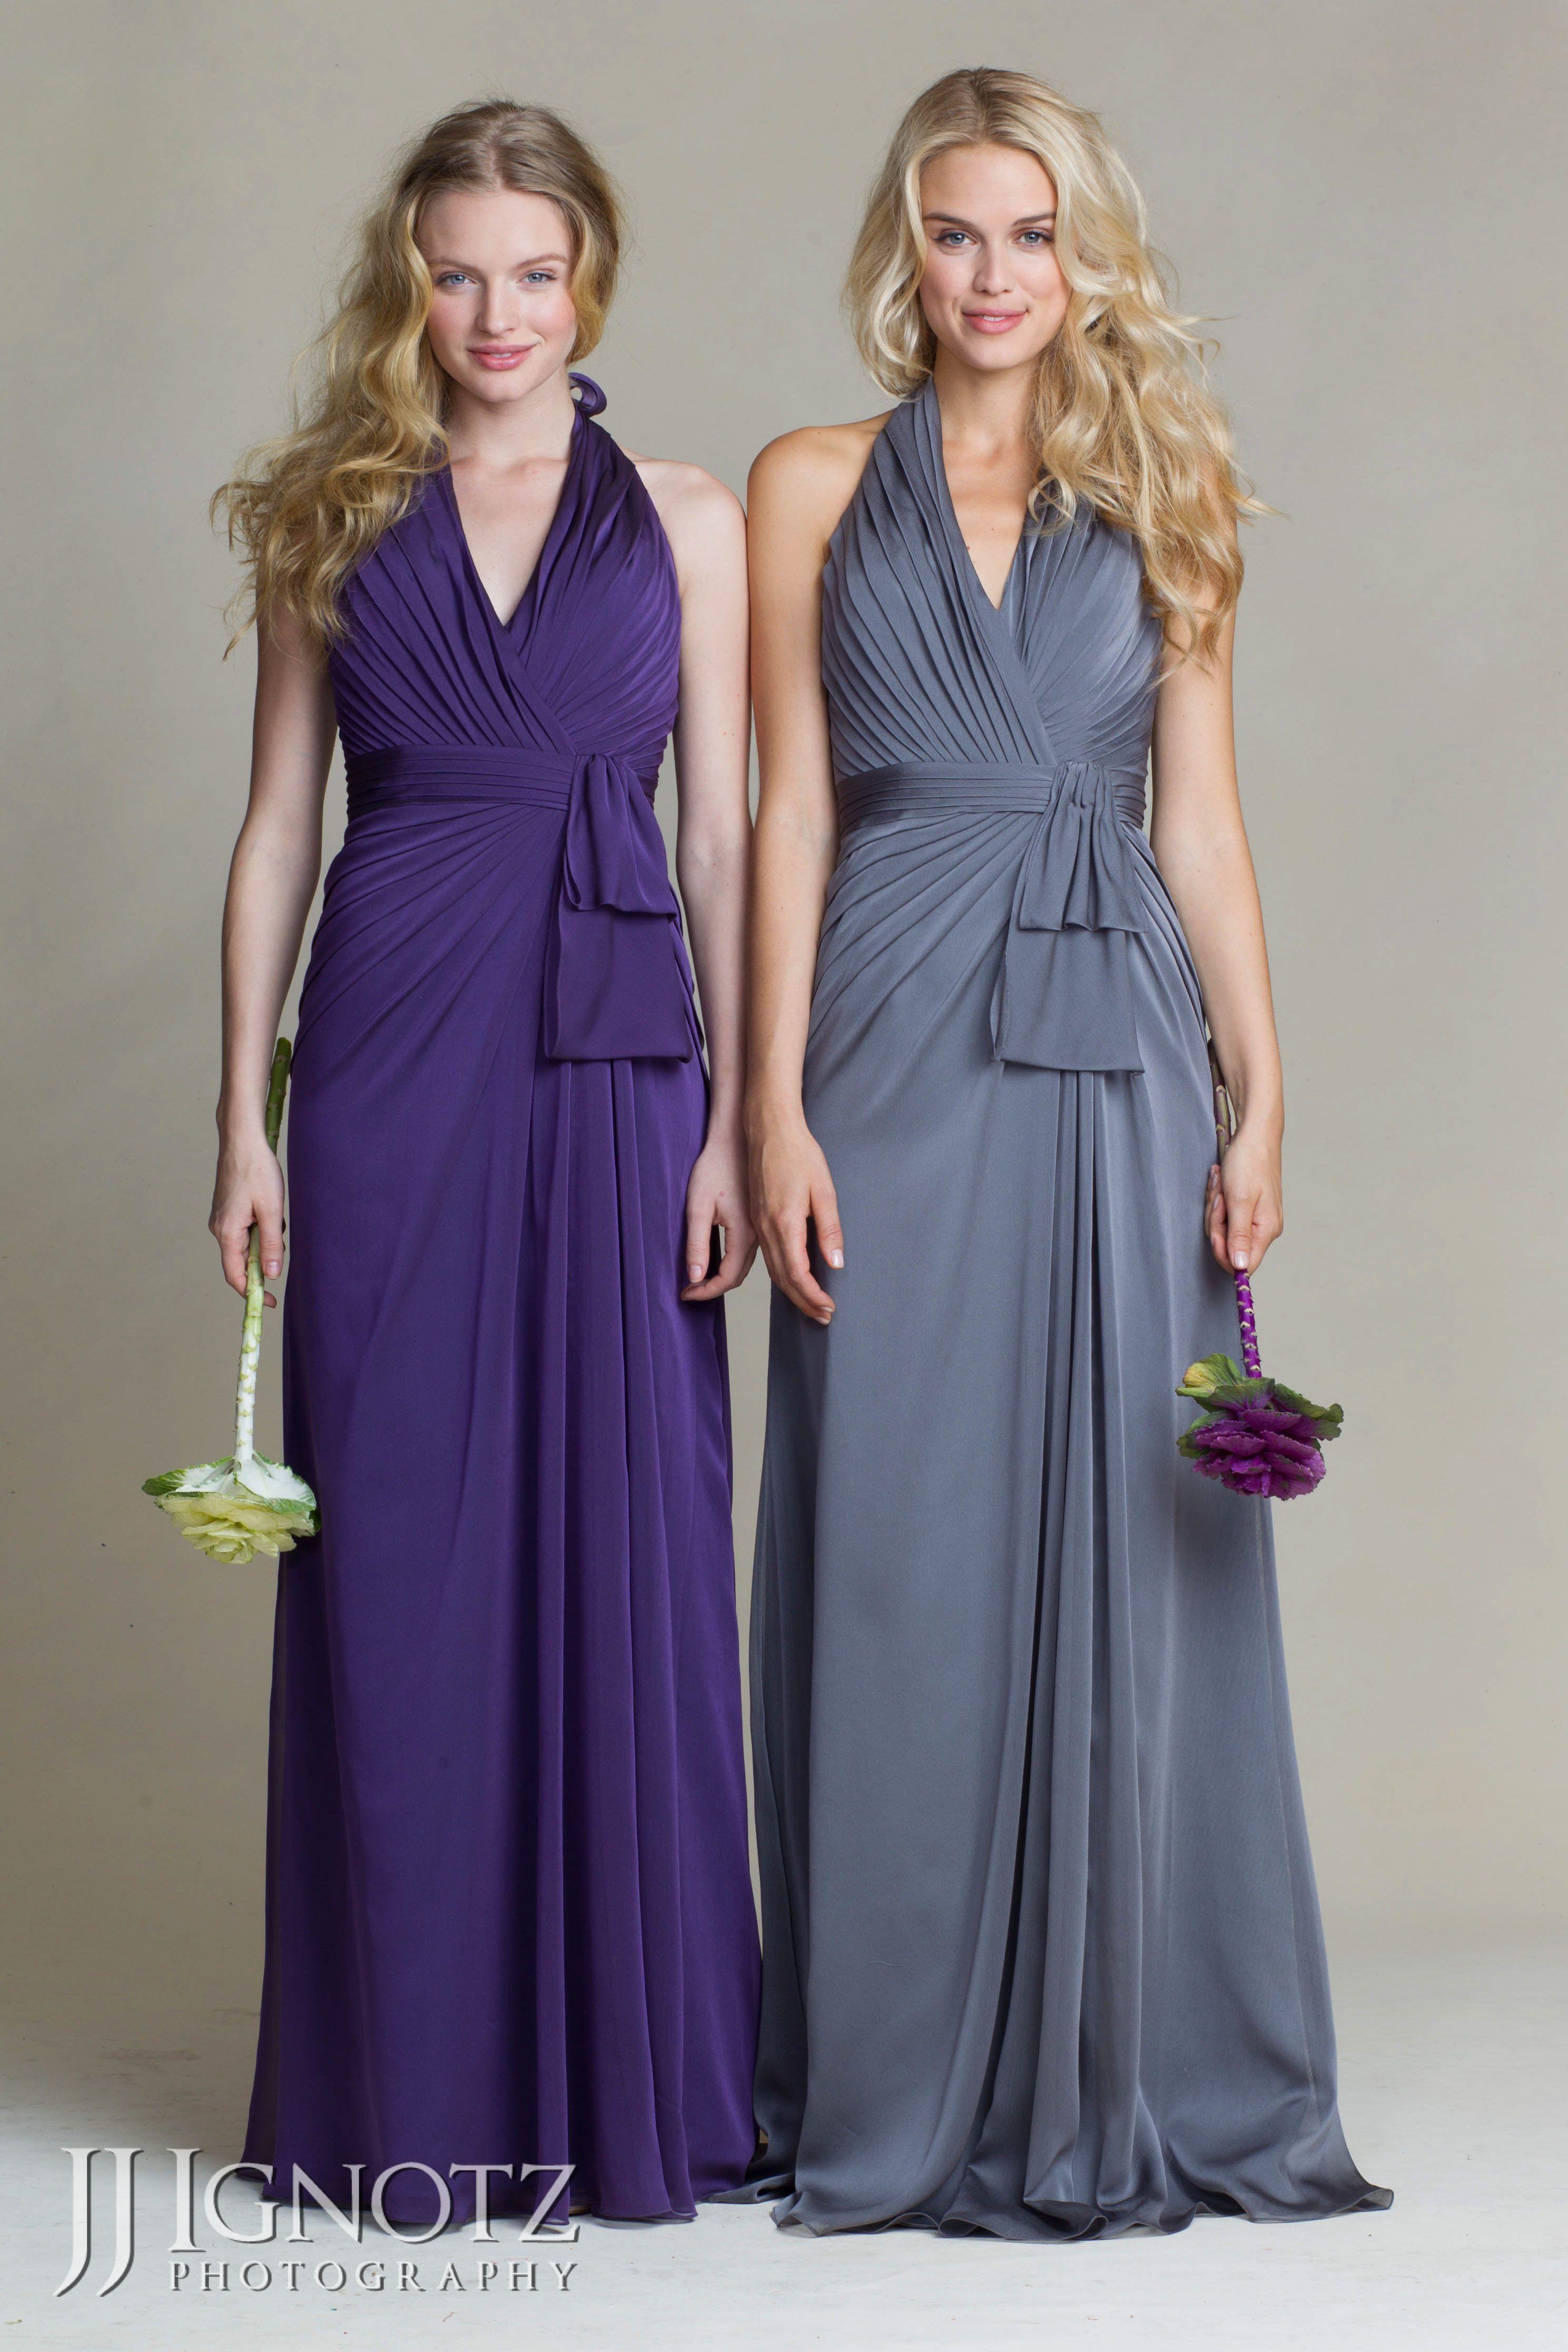 Bridesmaids Dresses China Image collections - Braidsmaid Dress ...